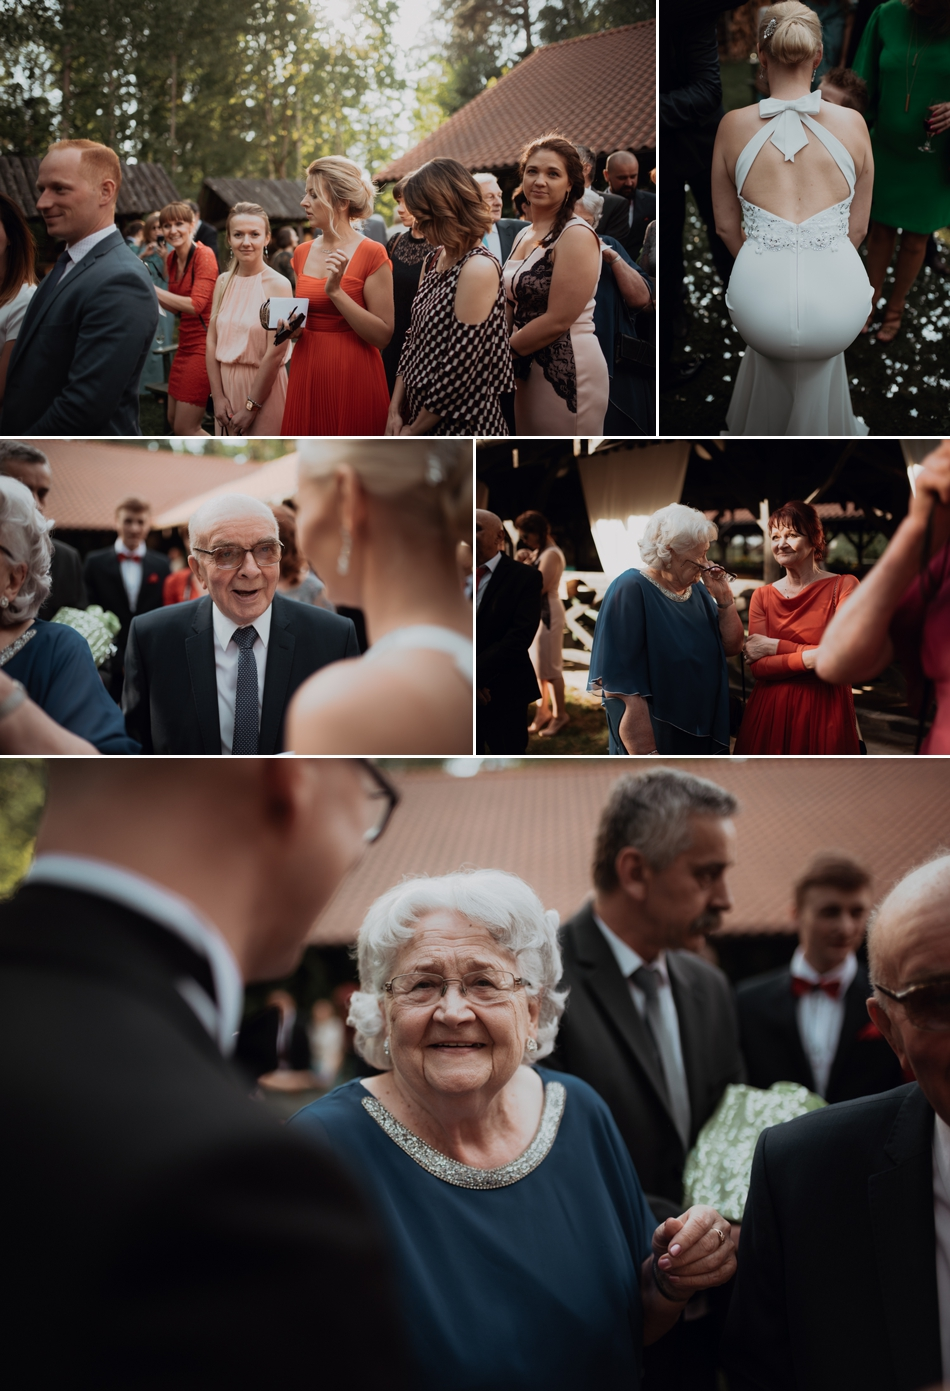 wedding-photographer-zukography-destination86.jpg